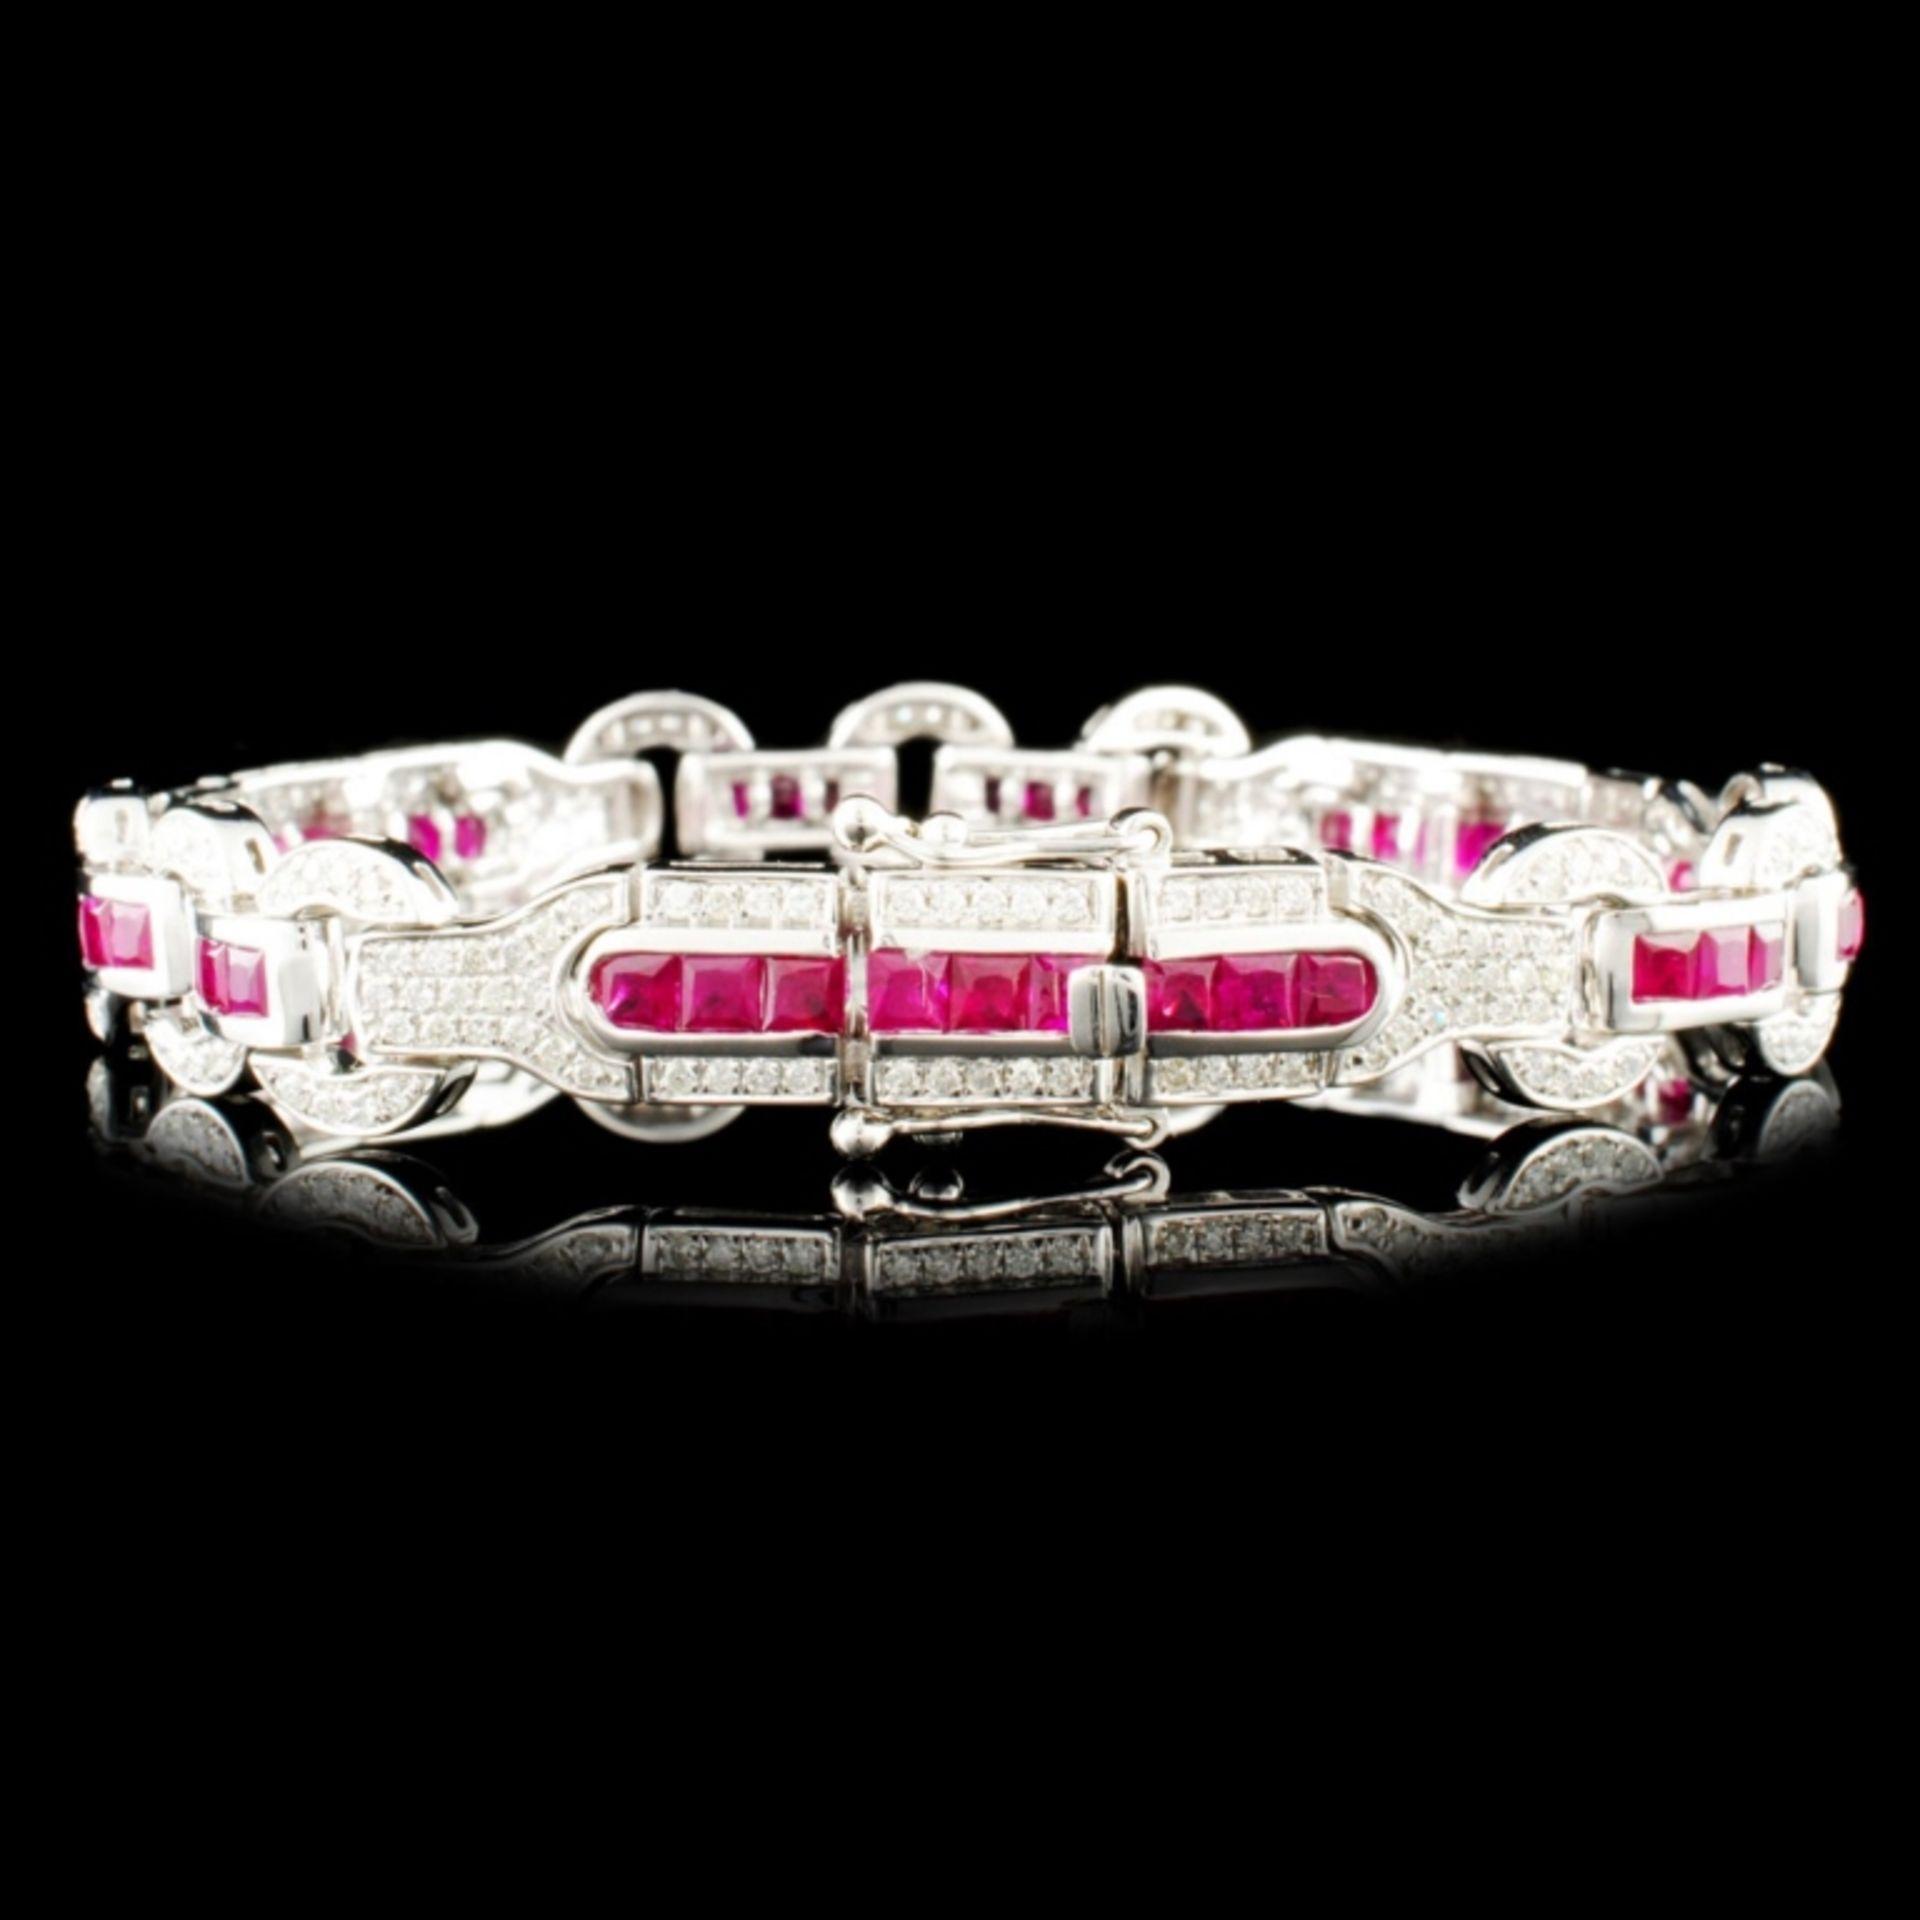 14K Gold 5.12ct Ruby & 1.30ctw Diamond Bracelet - Image 2 of 4